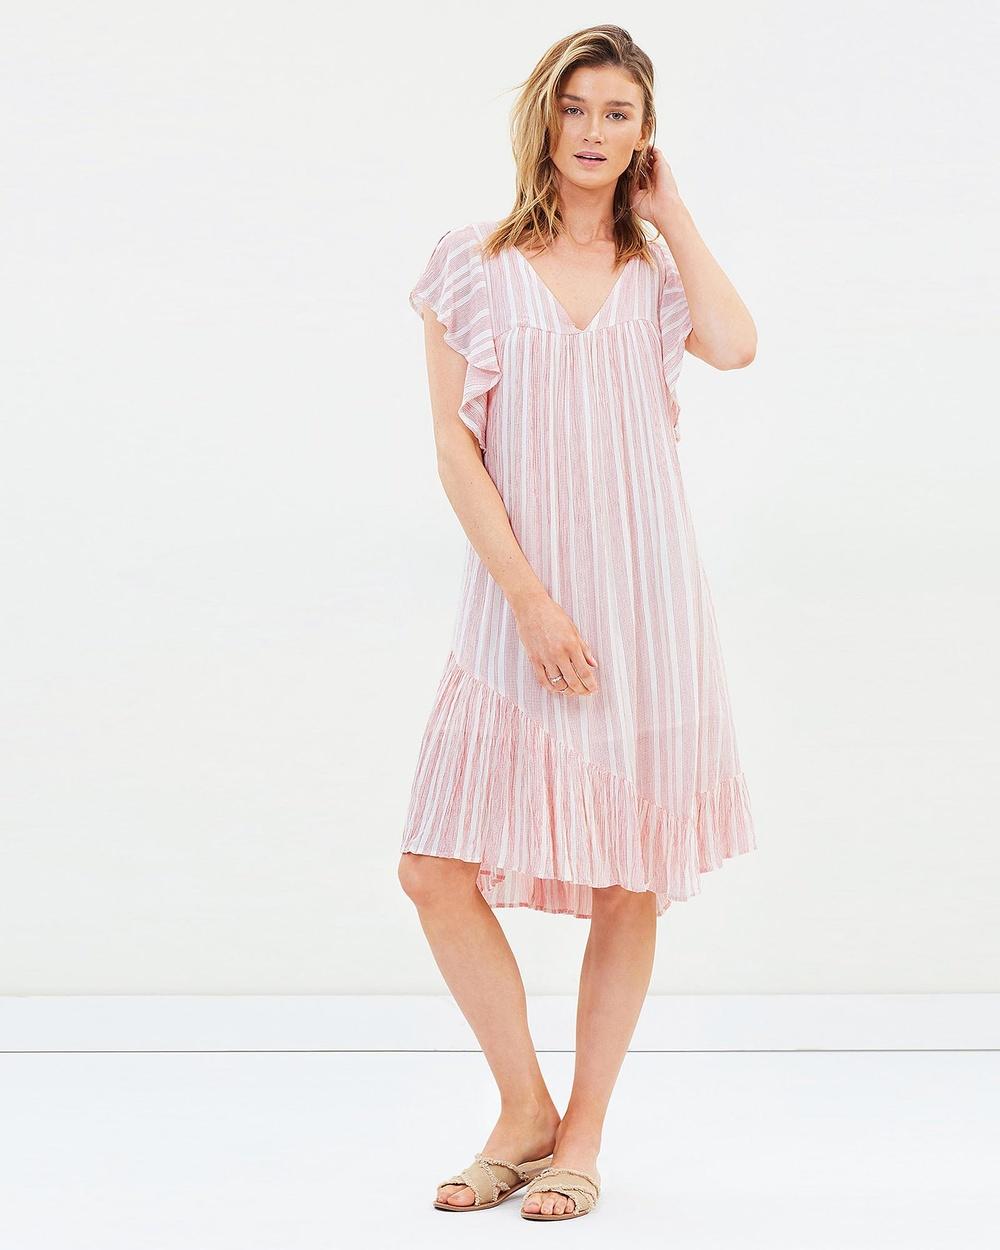 Solito Pink Desert Gypsy Frills Dress